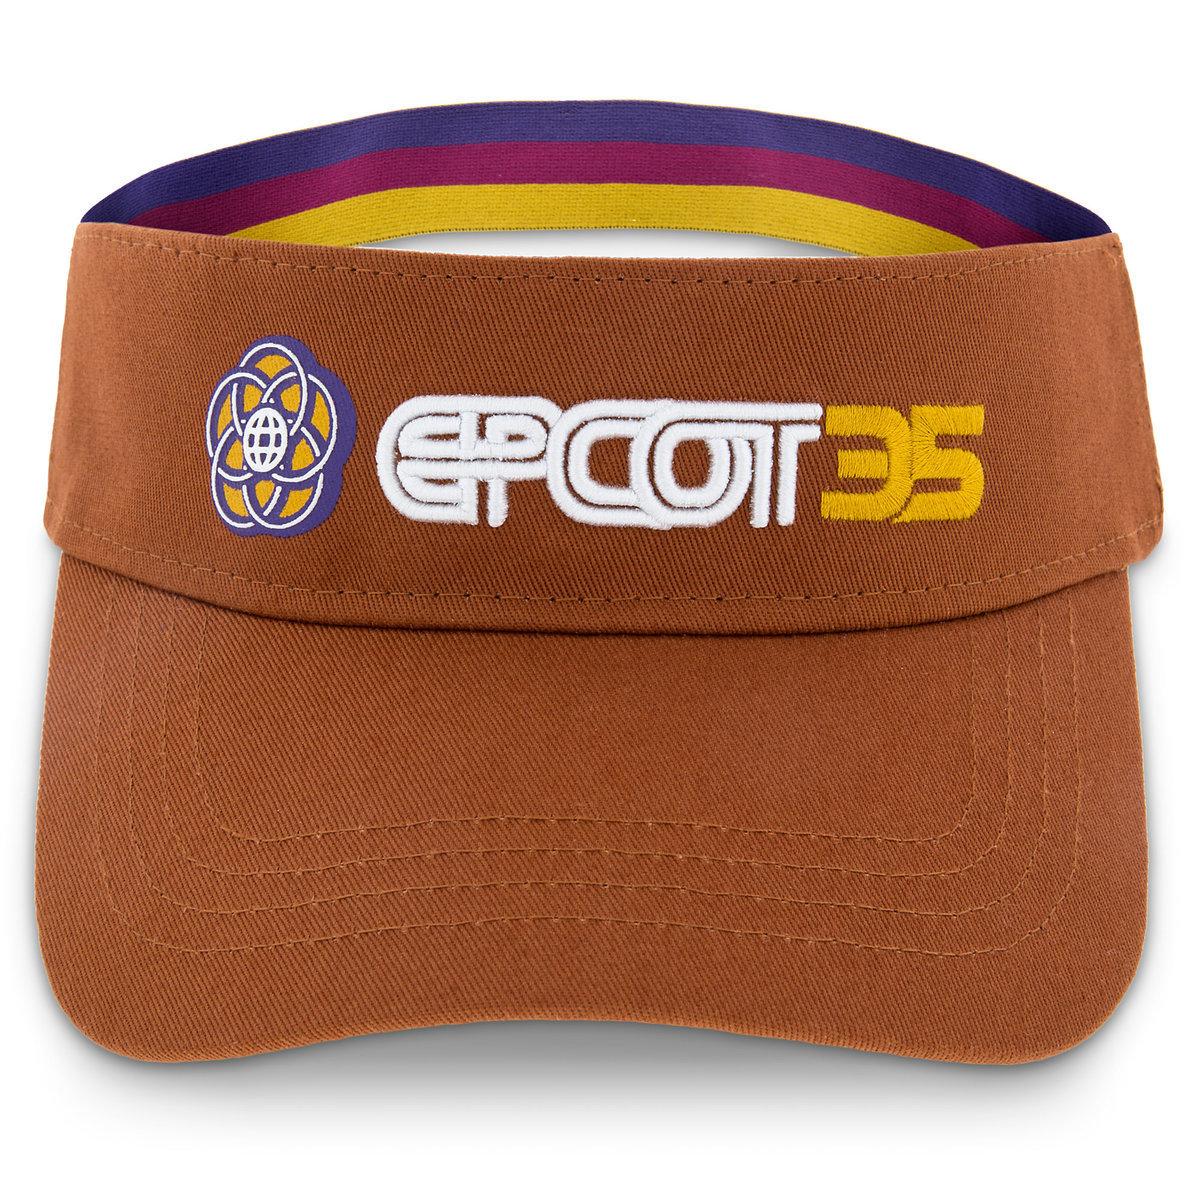 8c8405e7760 Disney Visor - Epcot 35th Anniversary